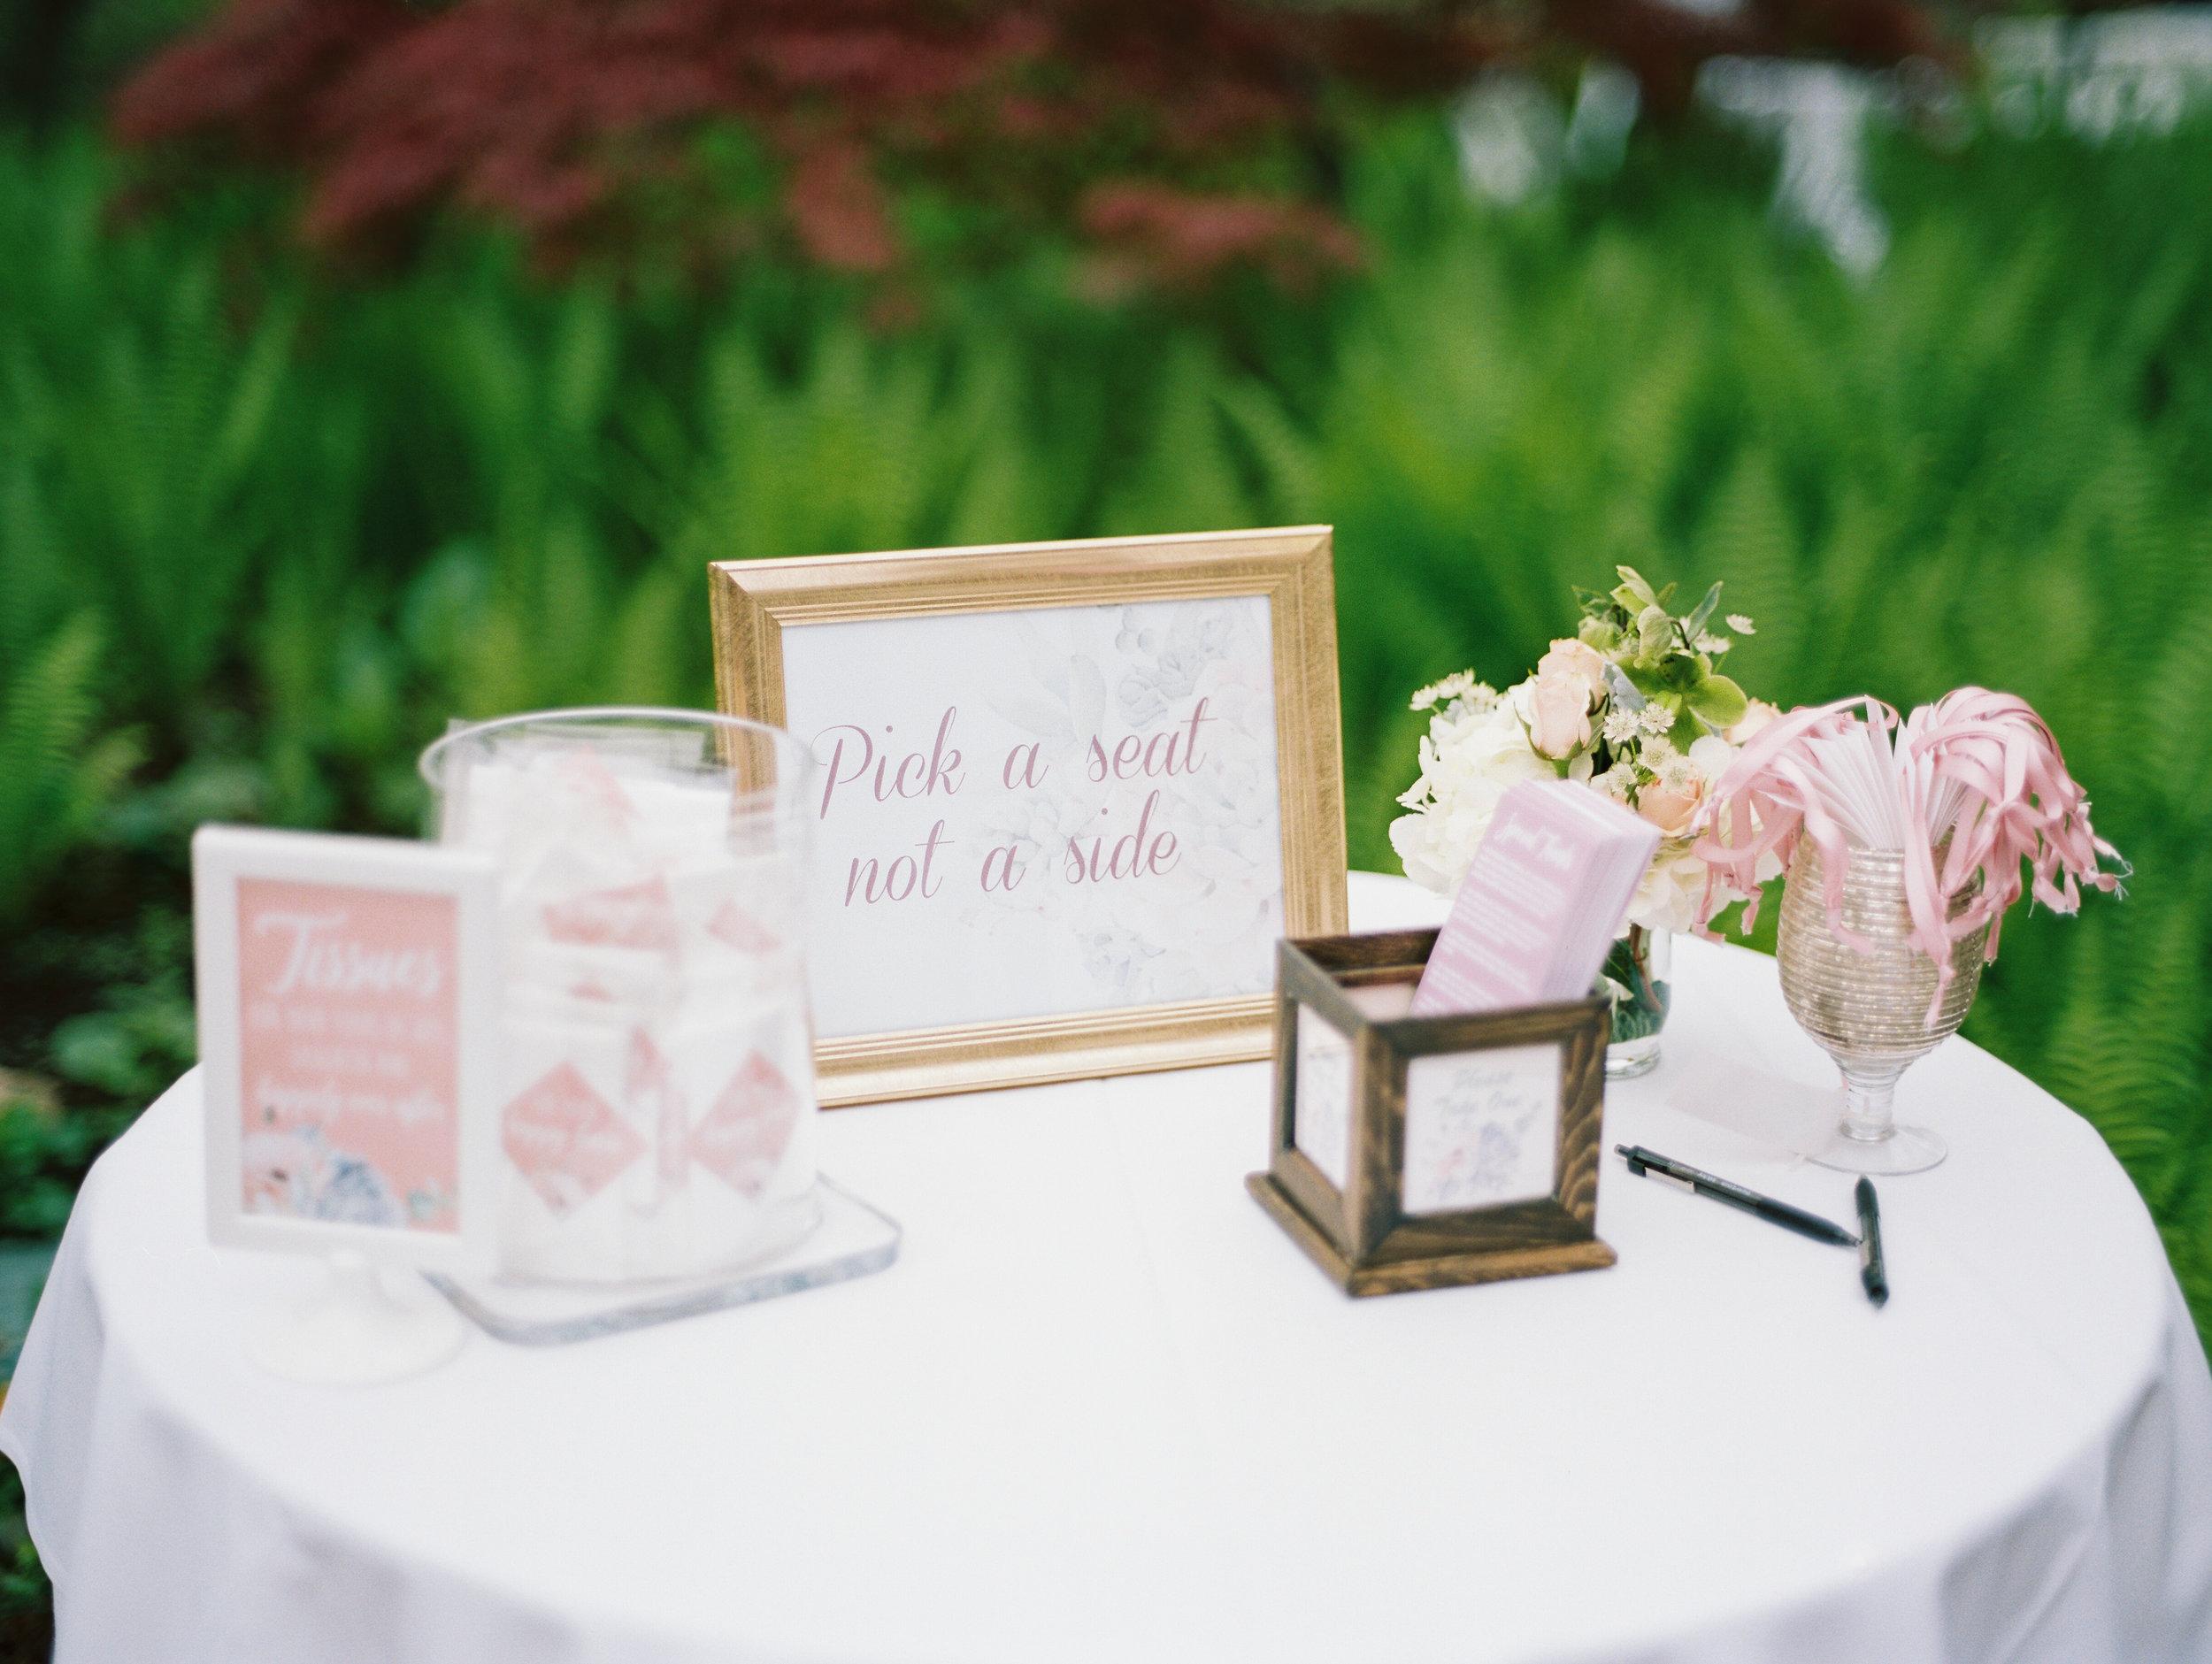 20180428-zakula-molczyk-wedding-108.jpg